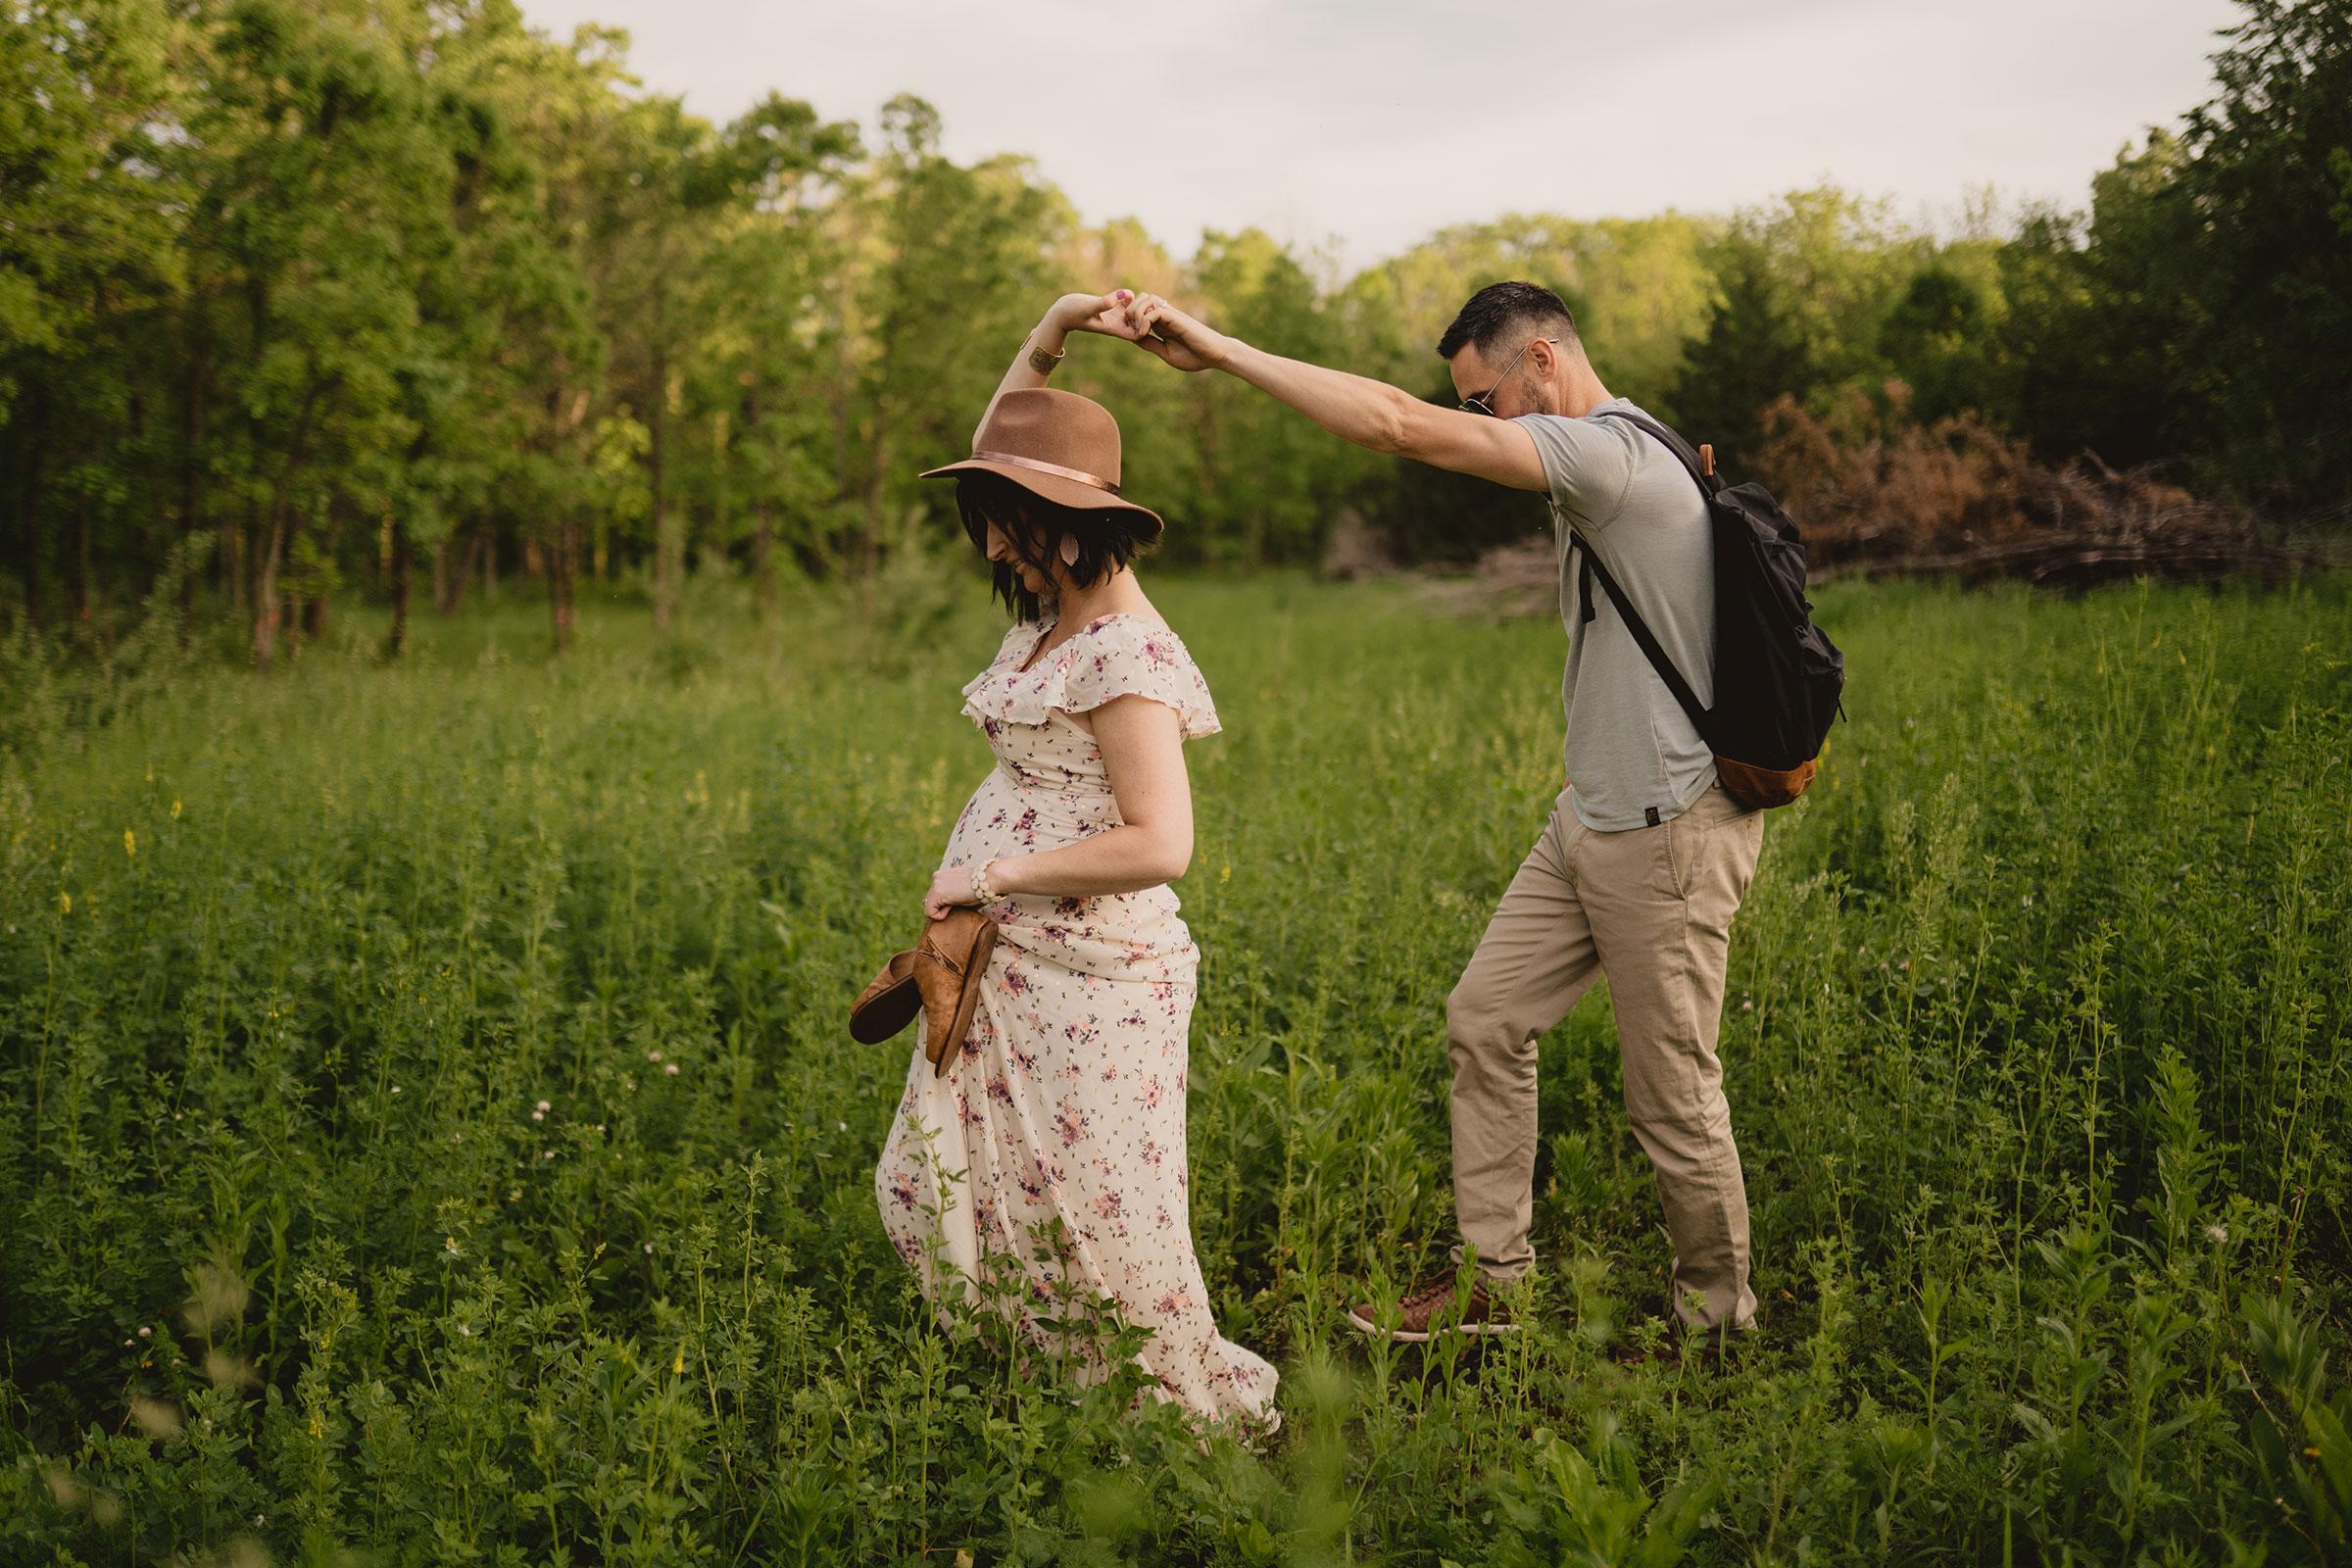 pregnant-woman-and-husband-walking-through-tall-grass-maternity-desmoines-iowa-raelyn-ramey-photography.jpg